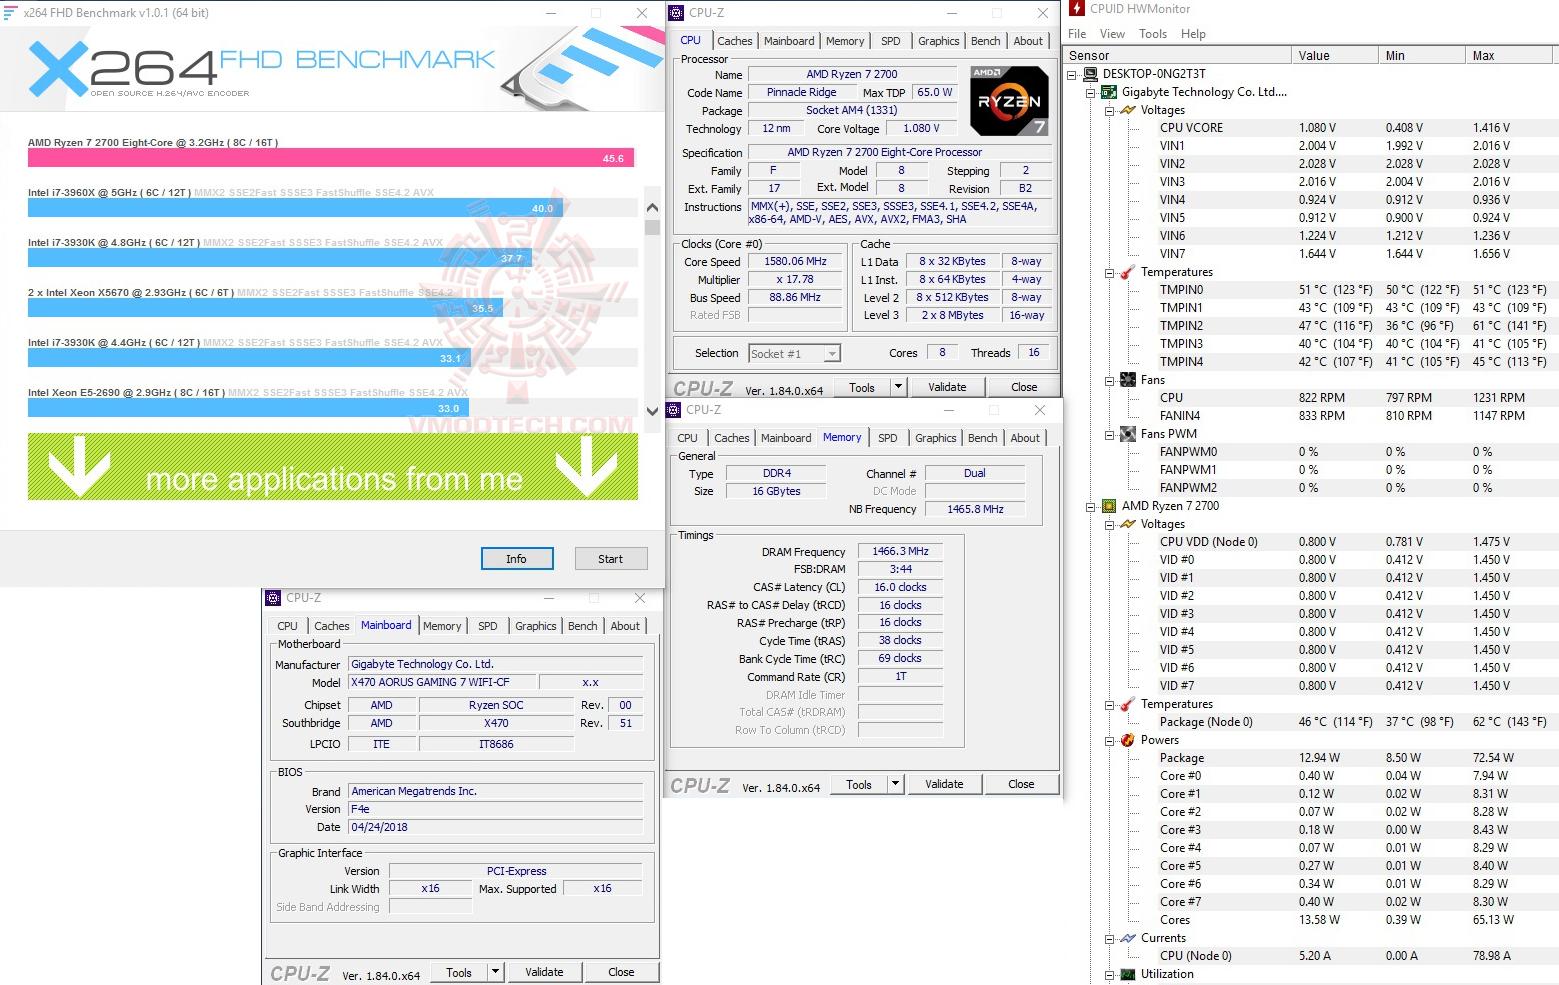 x264 AMD RYZEN 7 2700 and StoreMI Technology Review